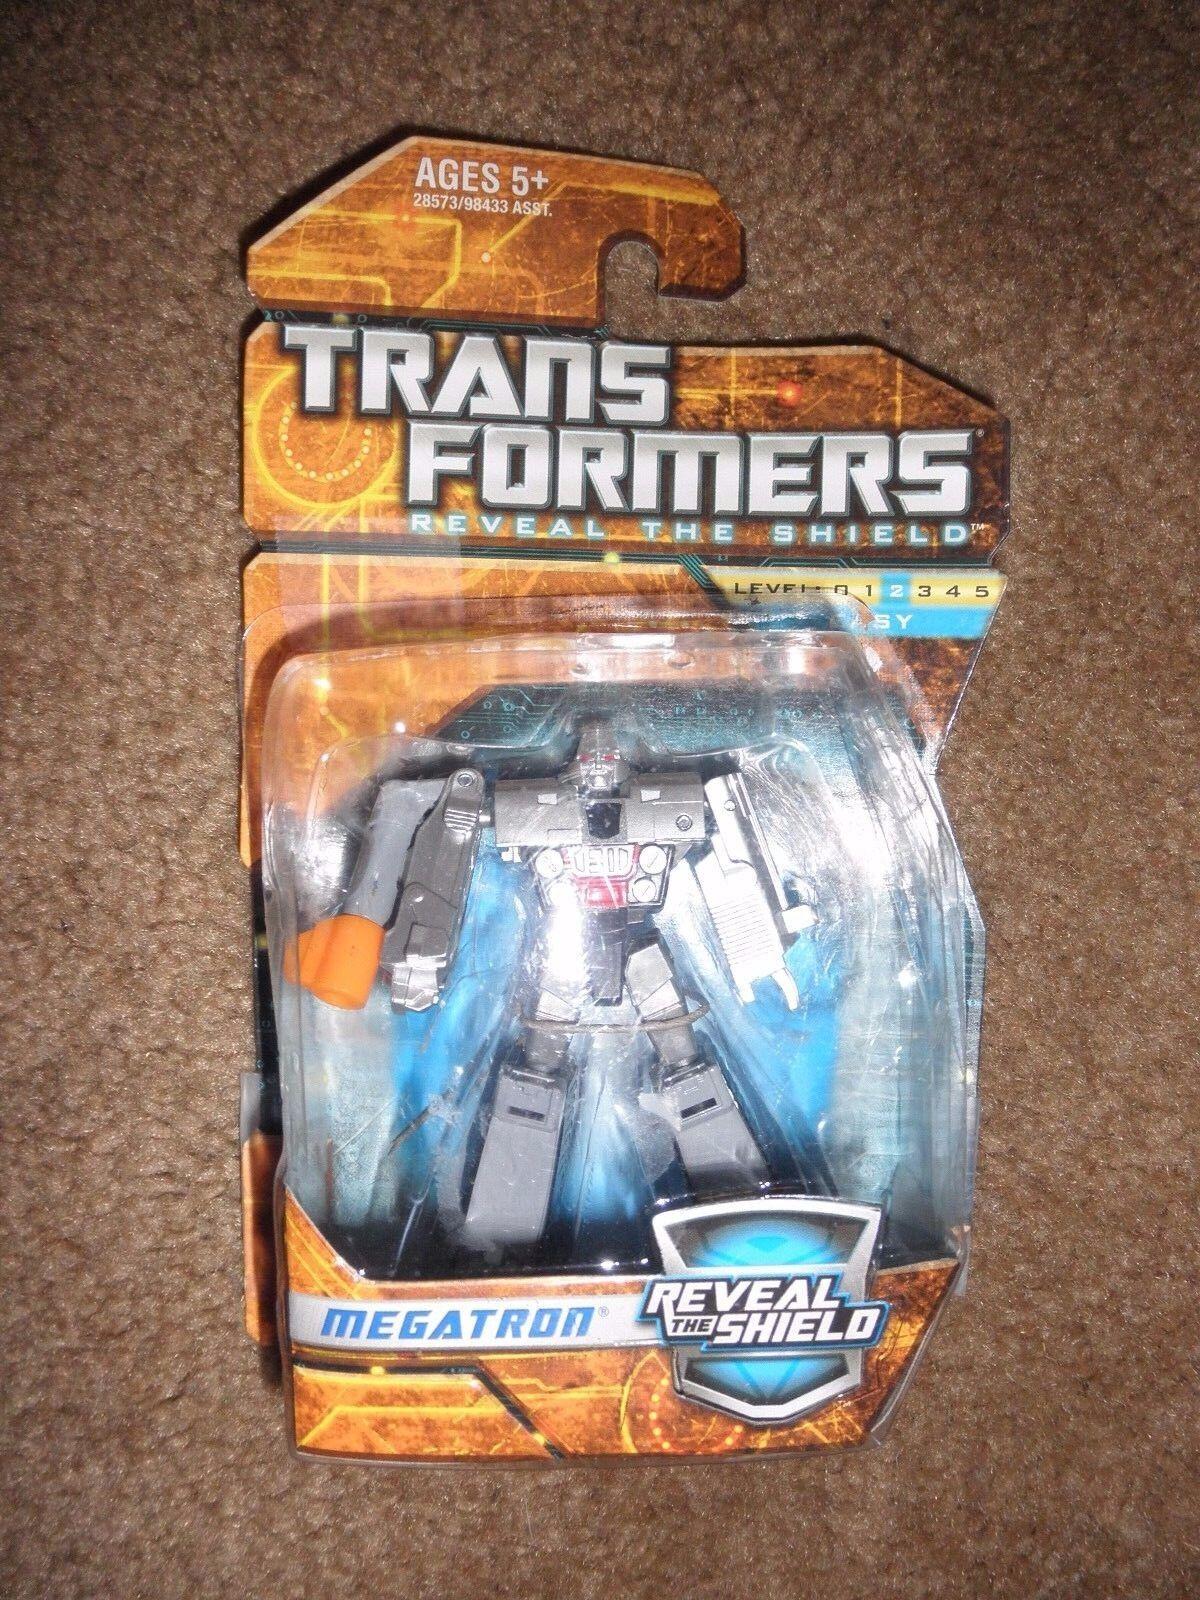 Transformers Reveal The Shield RTS Legends Class Megatron